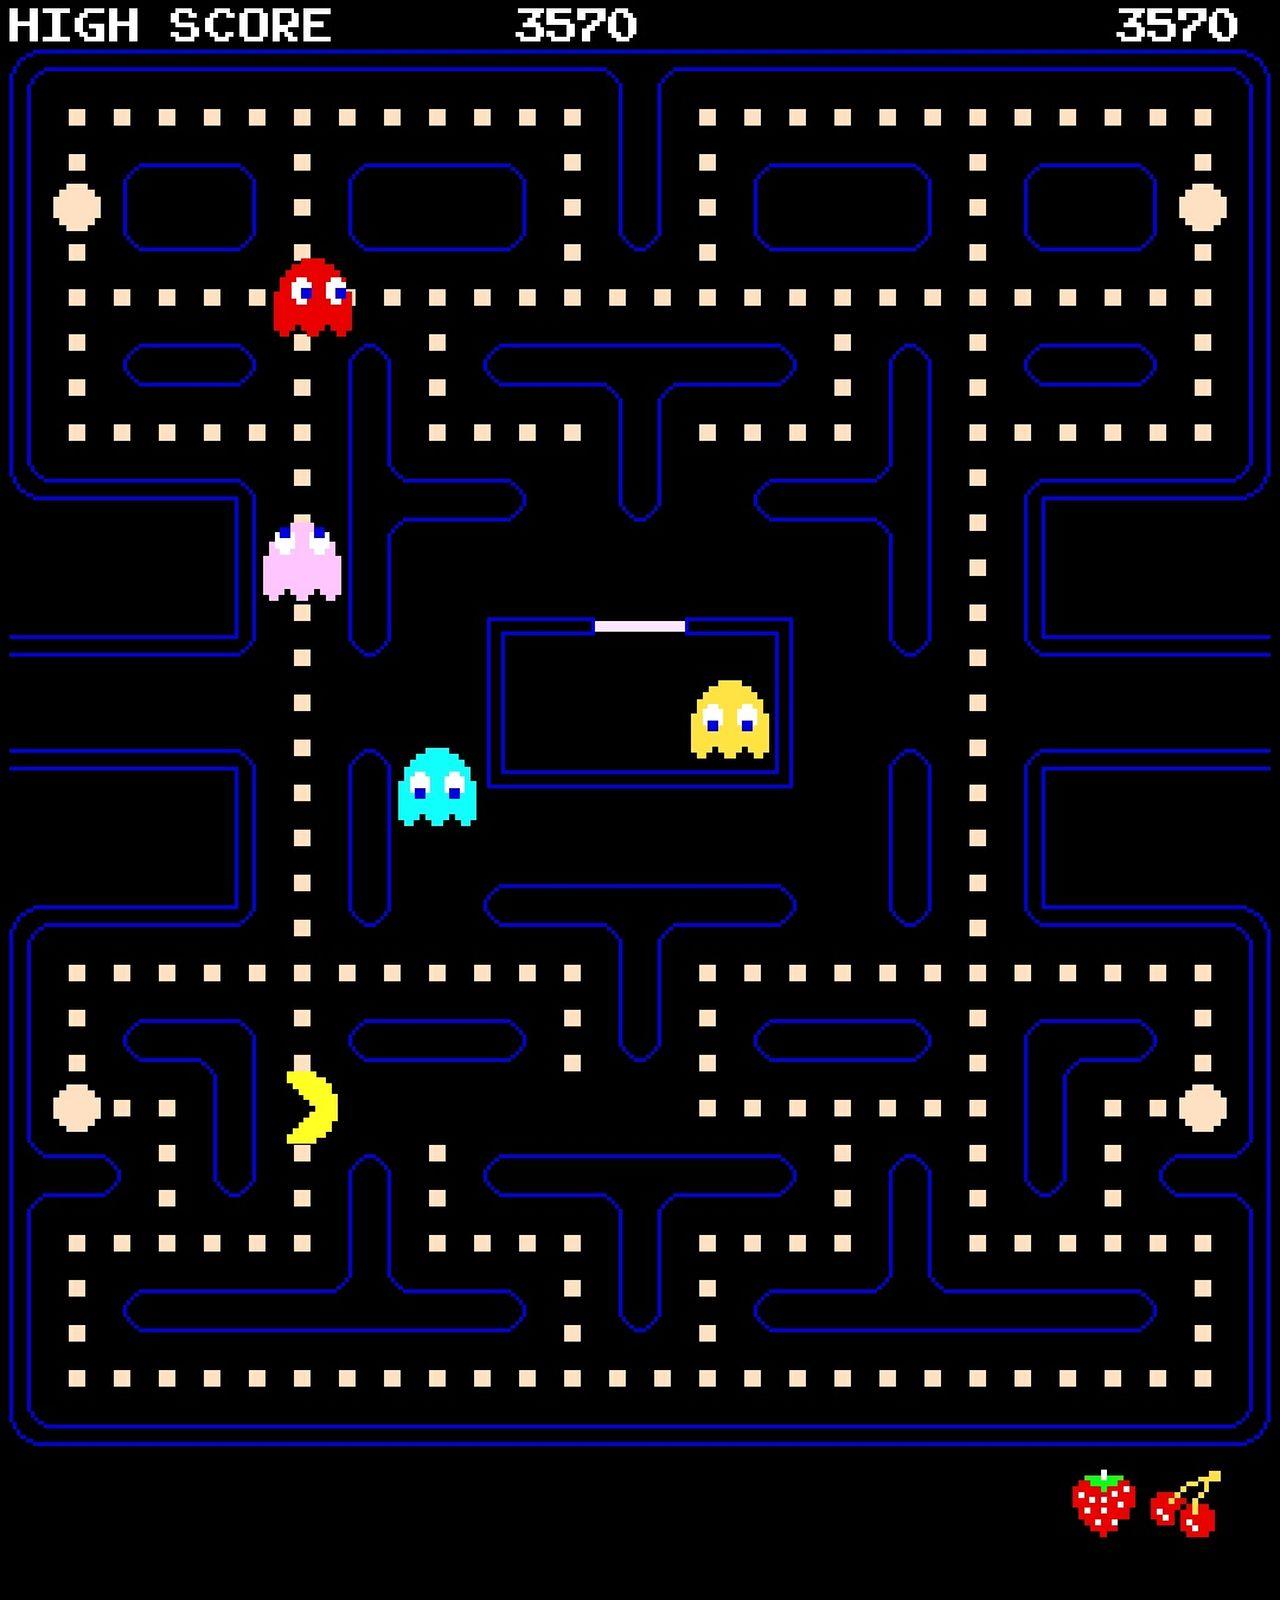 Technology Graph Computer Internet Pacman Pacman Games Technology Videogames Night Classic